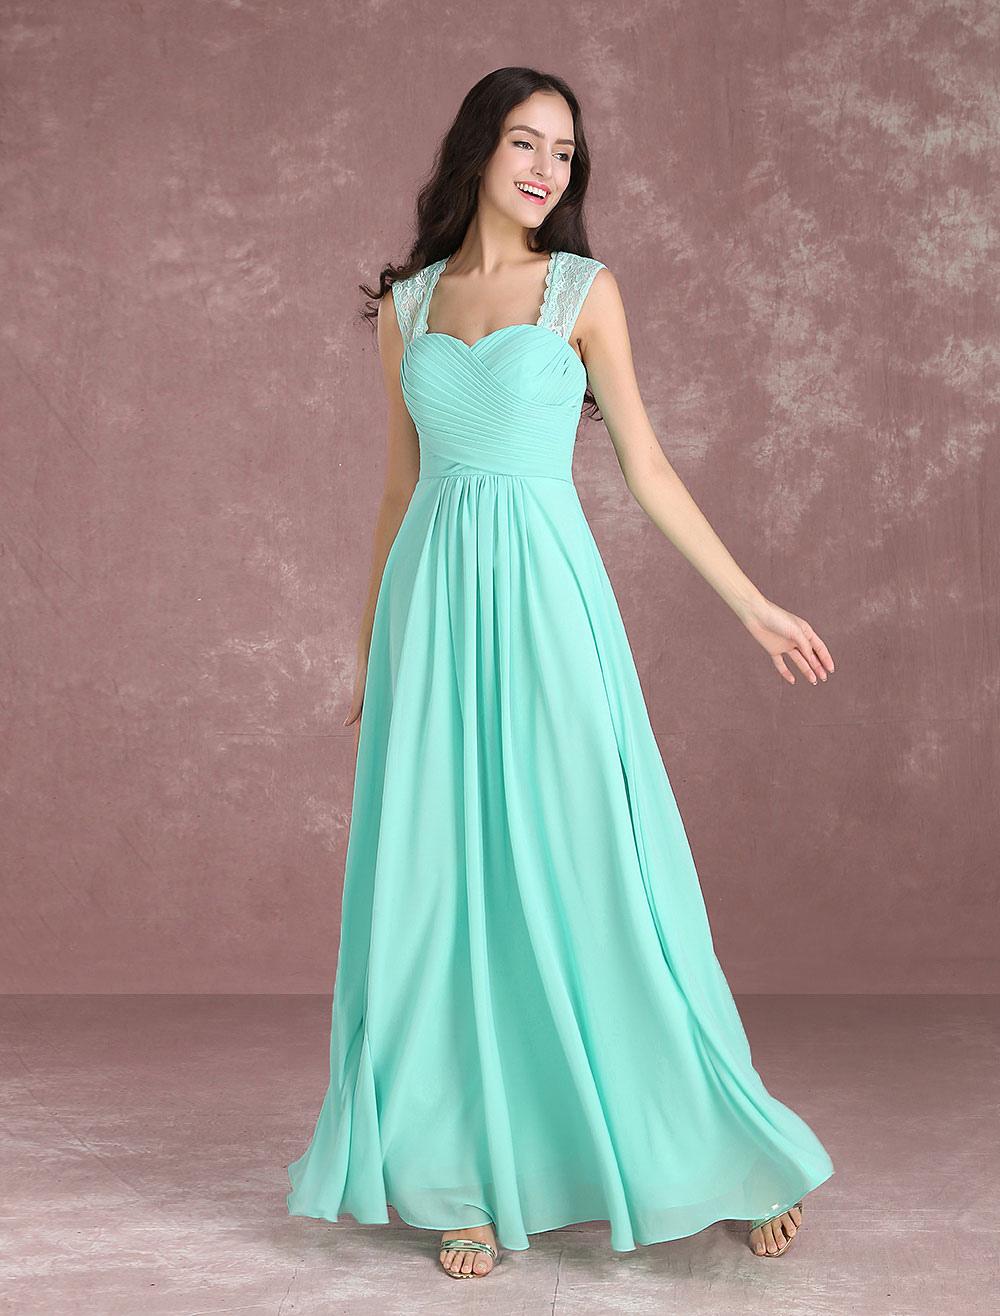 Long Bridesmaid Dresses Chiffon Mint Green Prom Dresses 2018 Sweetheart Wide Straps Keyhole Floor Length Party Dress (Wedding) photo